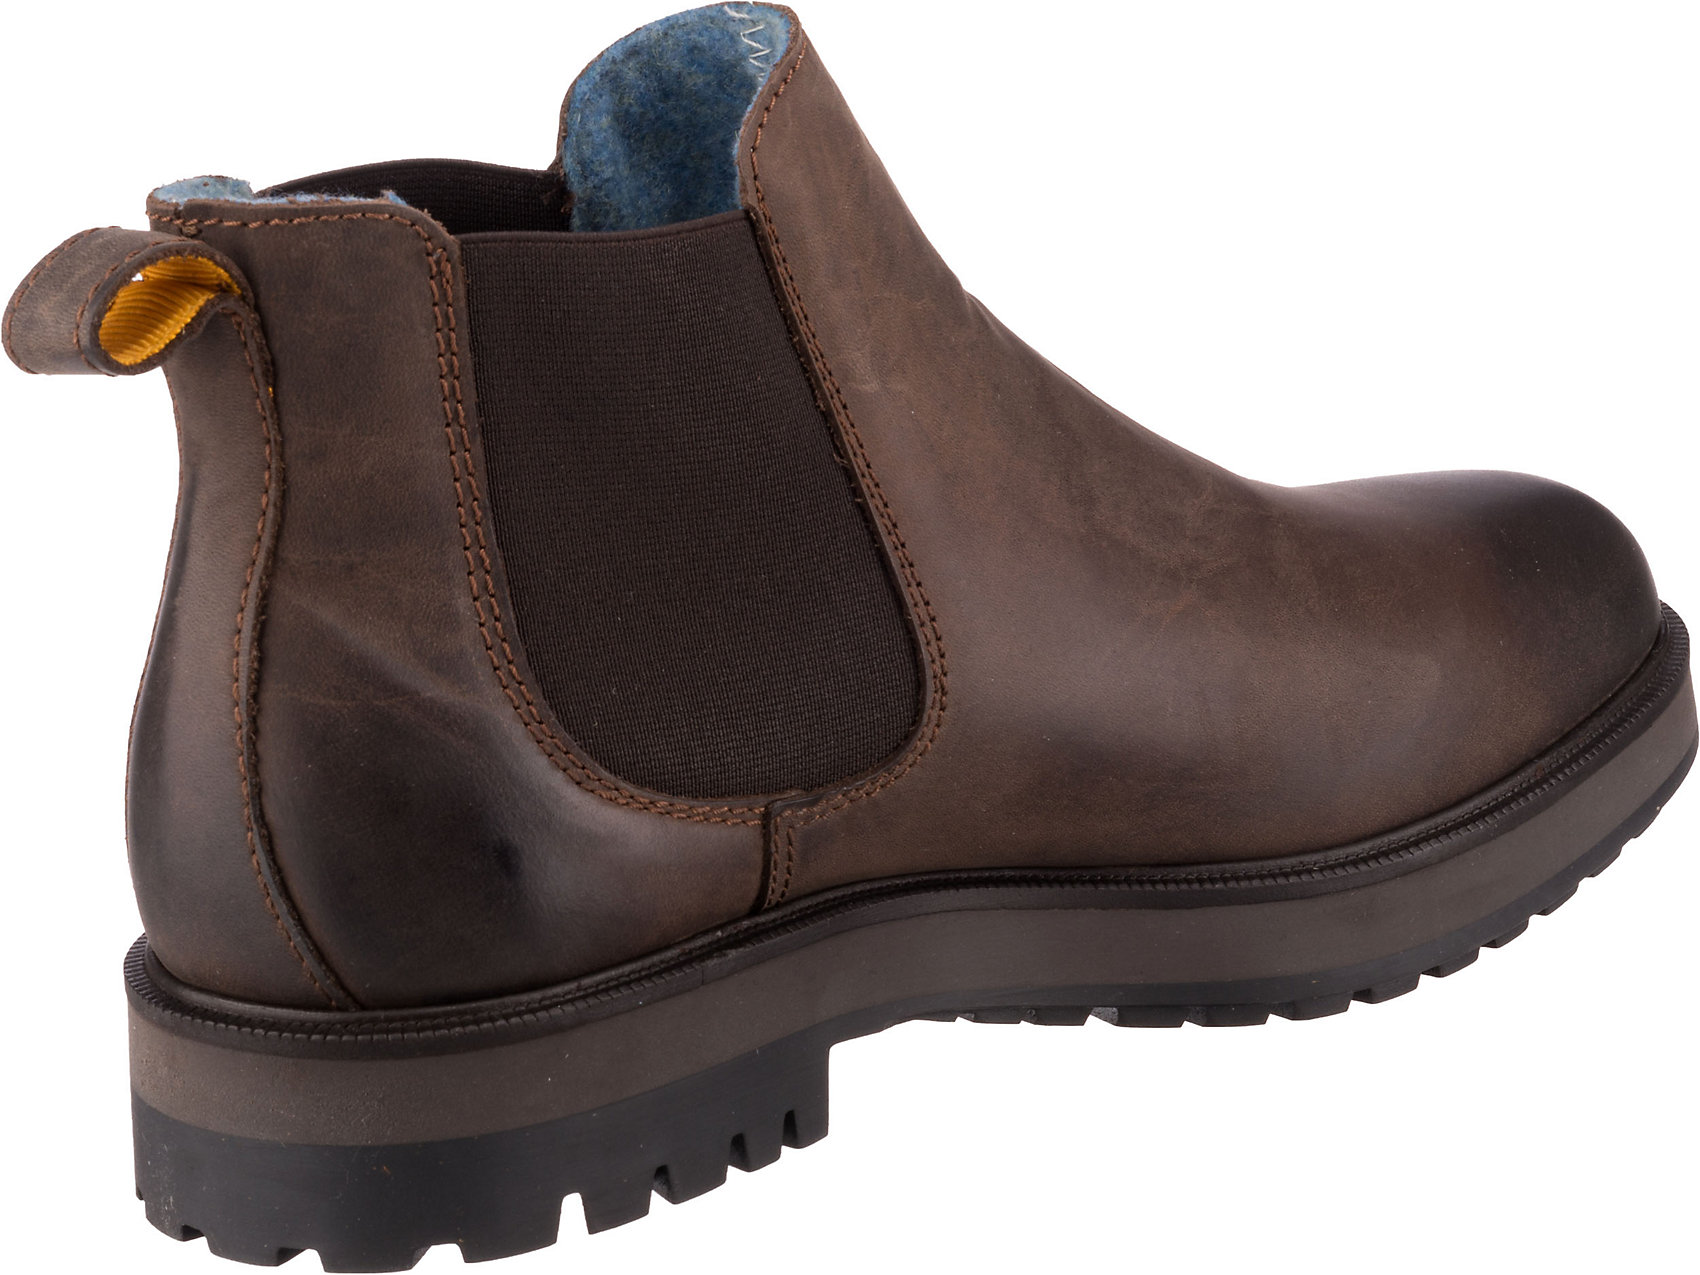 Neu camel active Stone Chelsea Boots 15945869 für Damen